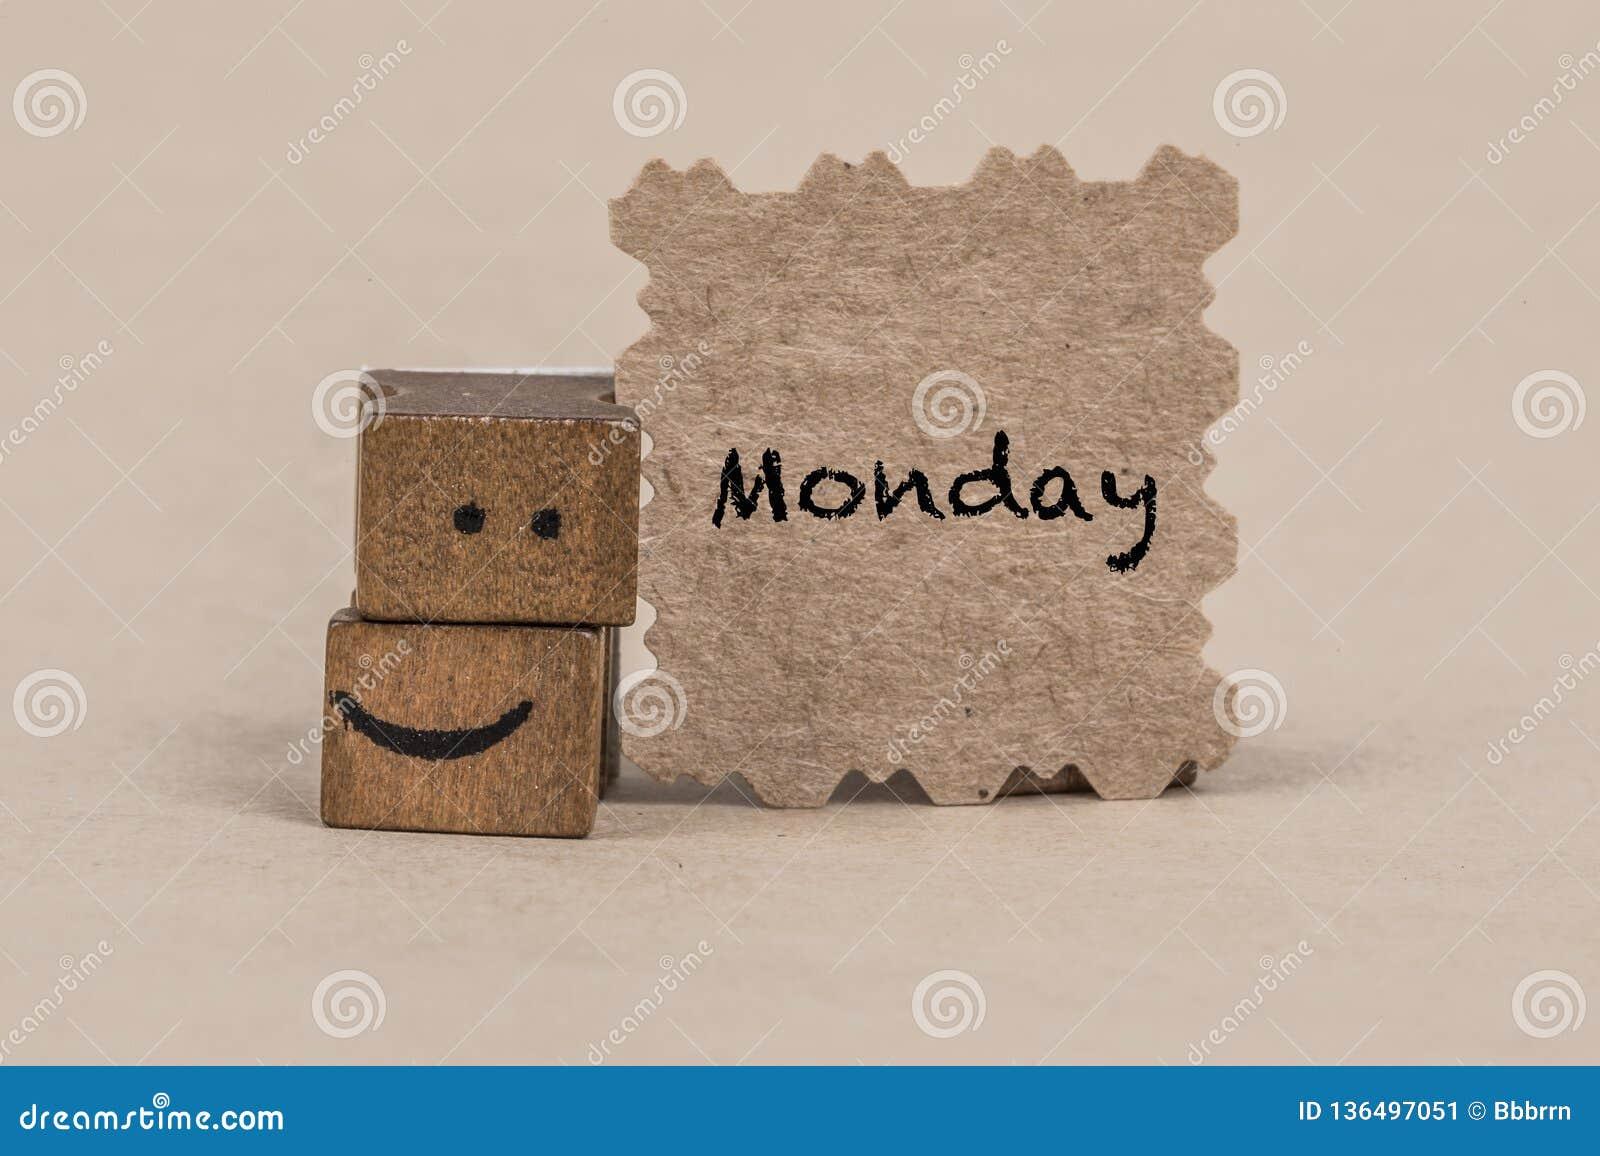 Calibre pour lundi avec une icône souriante